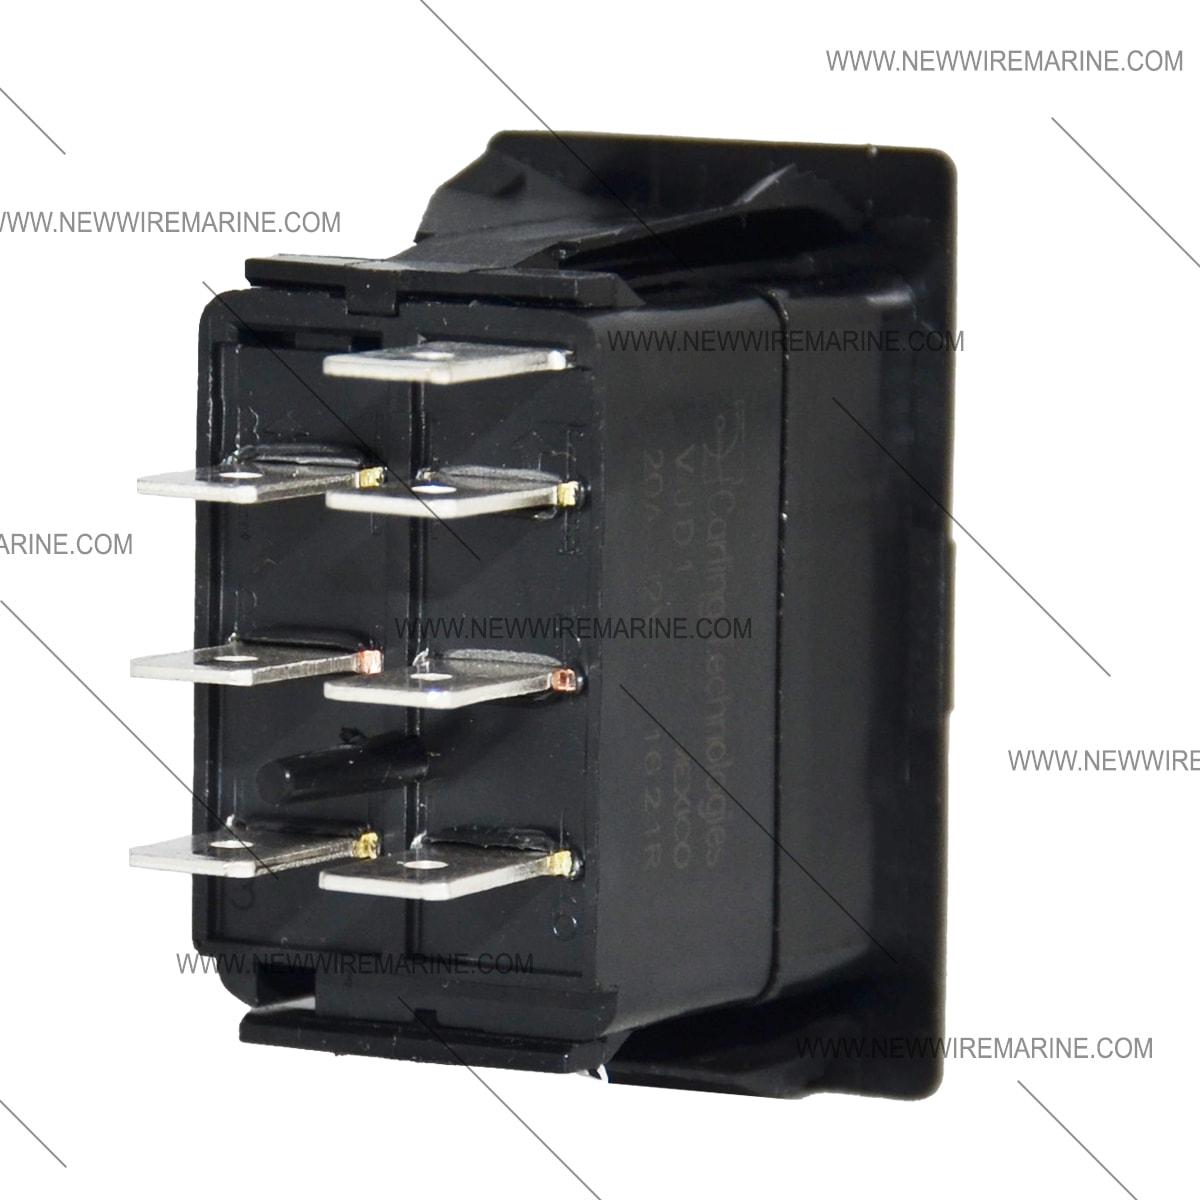 On-Off-On | Marine Rocker Switch | Carling Vjd1 | New Wire Marine - 3 Pin Rocker Switch Wiring Diagram